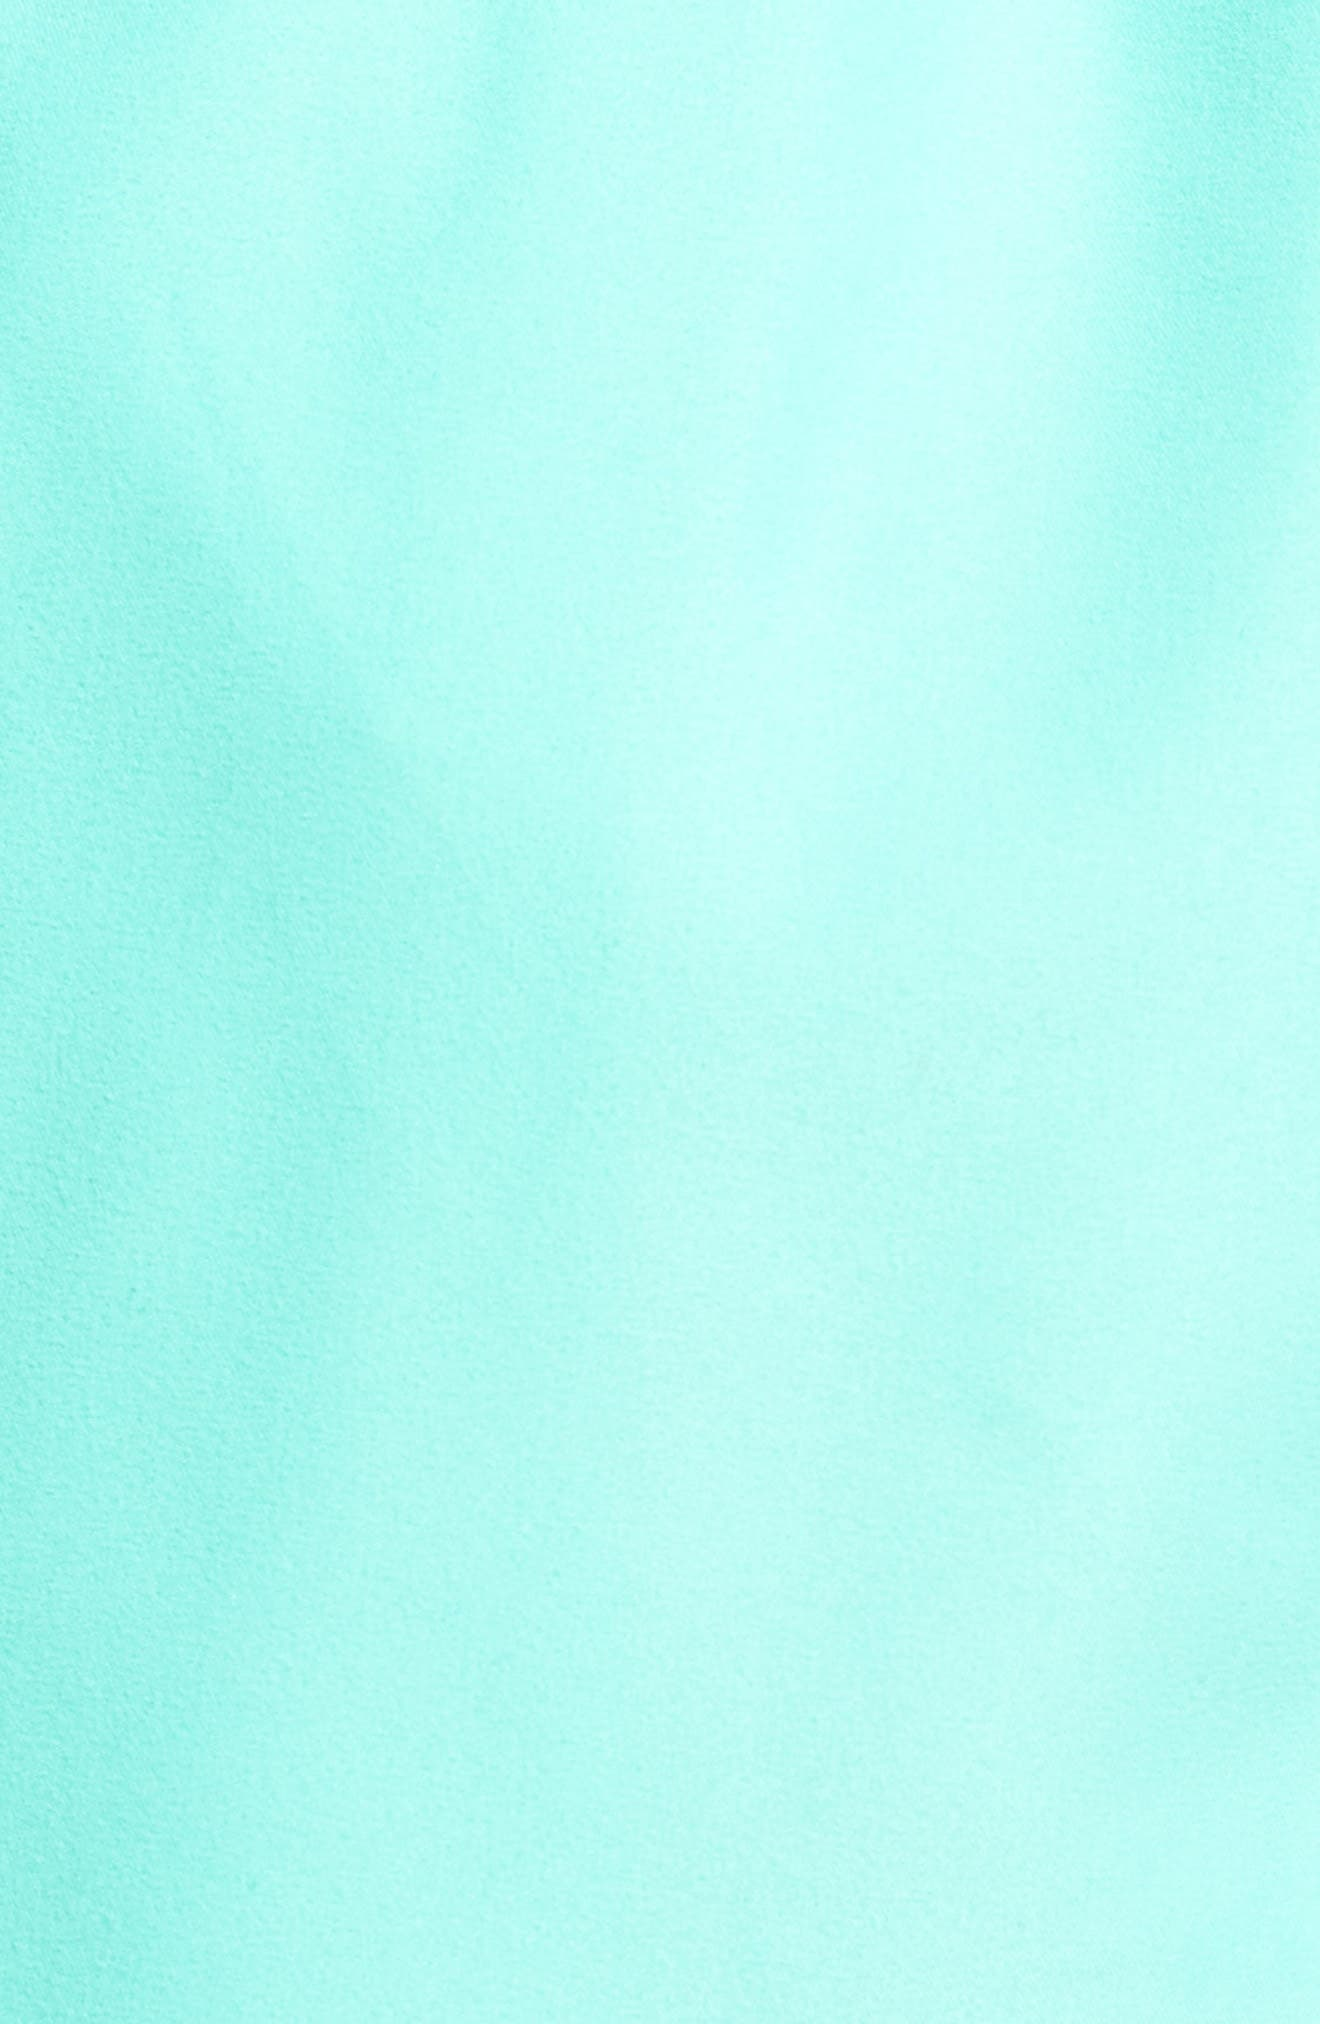 VINEYARD VINES,                             Tarpon Taping Chappy Swim Trunks,                             Alternate thumbnail 5, color,                             359